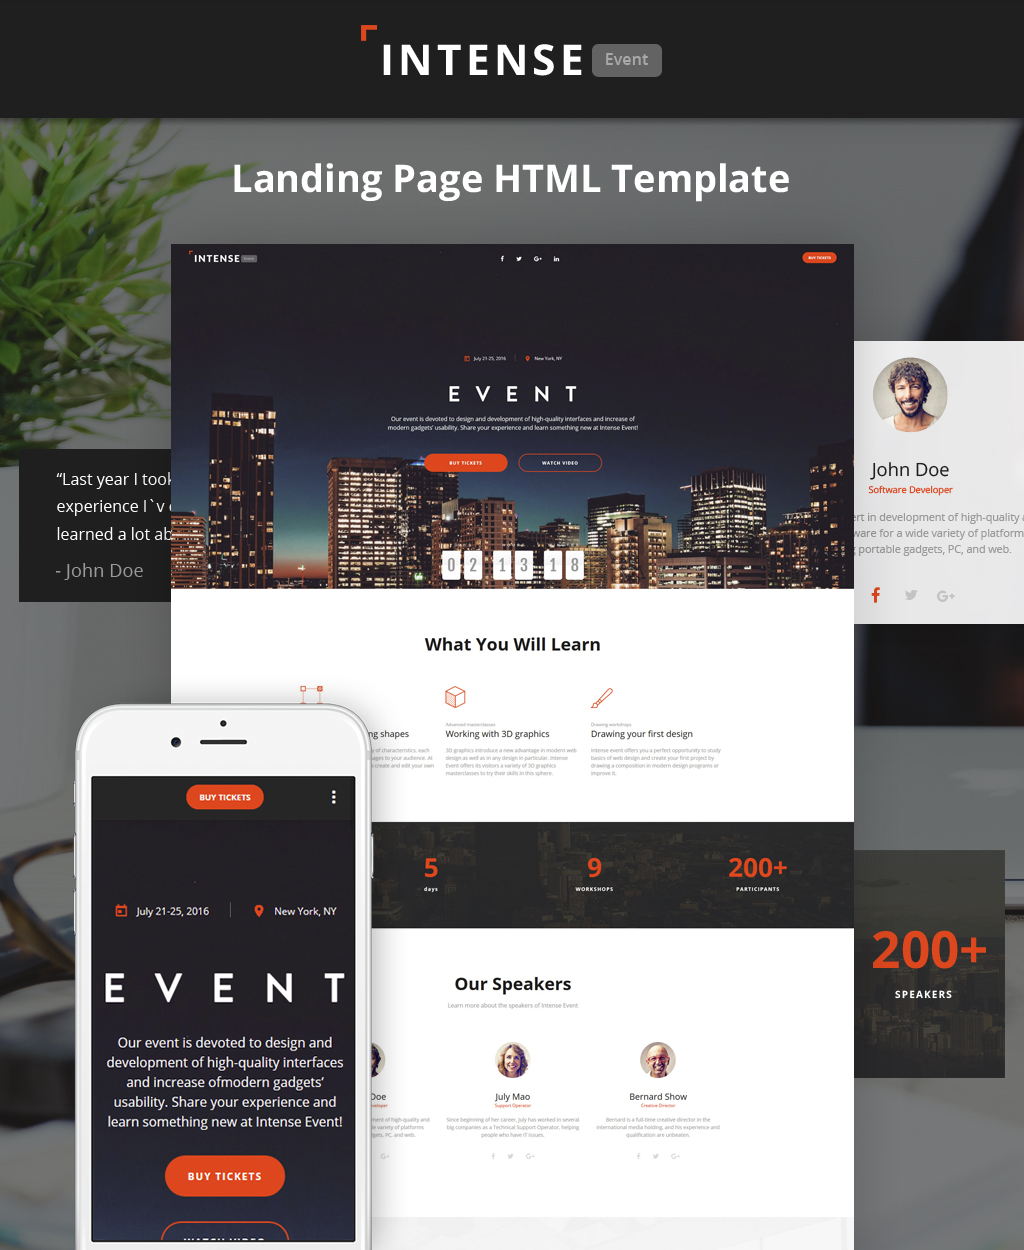 Intense - Event Planner HTML5 №62198 - скриншот